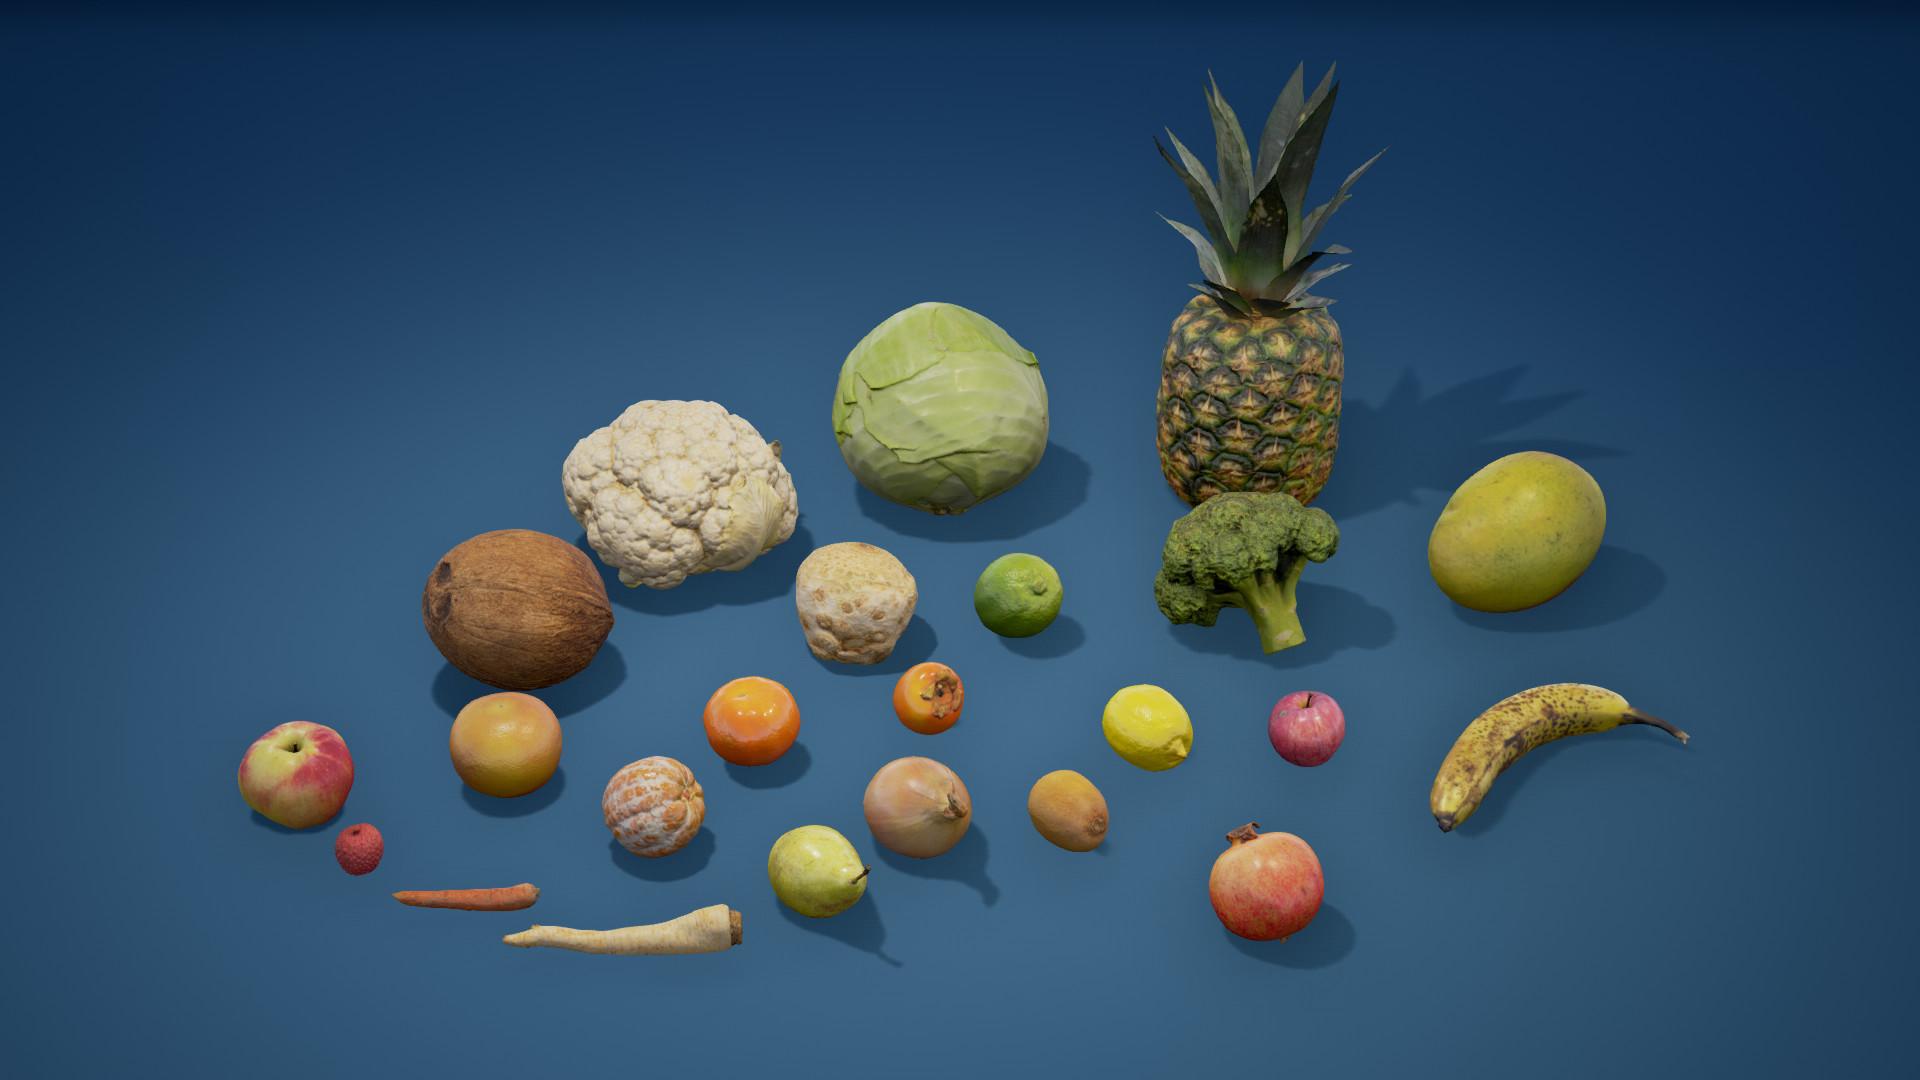 Krystian radziszewski photoscanned fruit and vegetables screenshot 0005